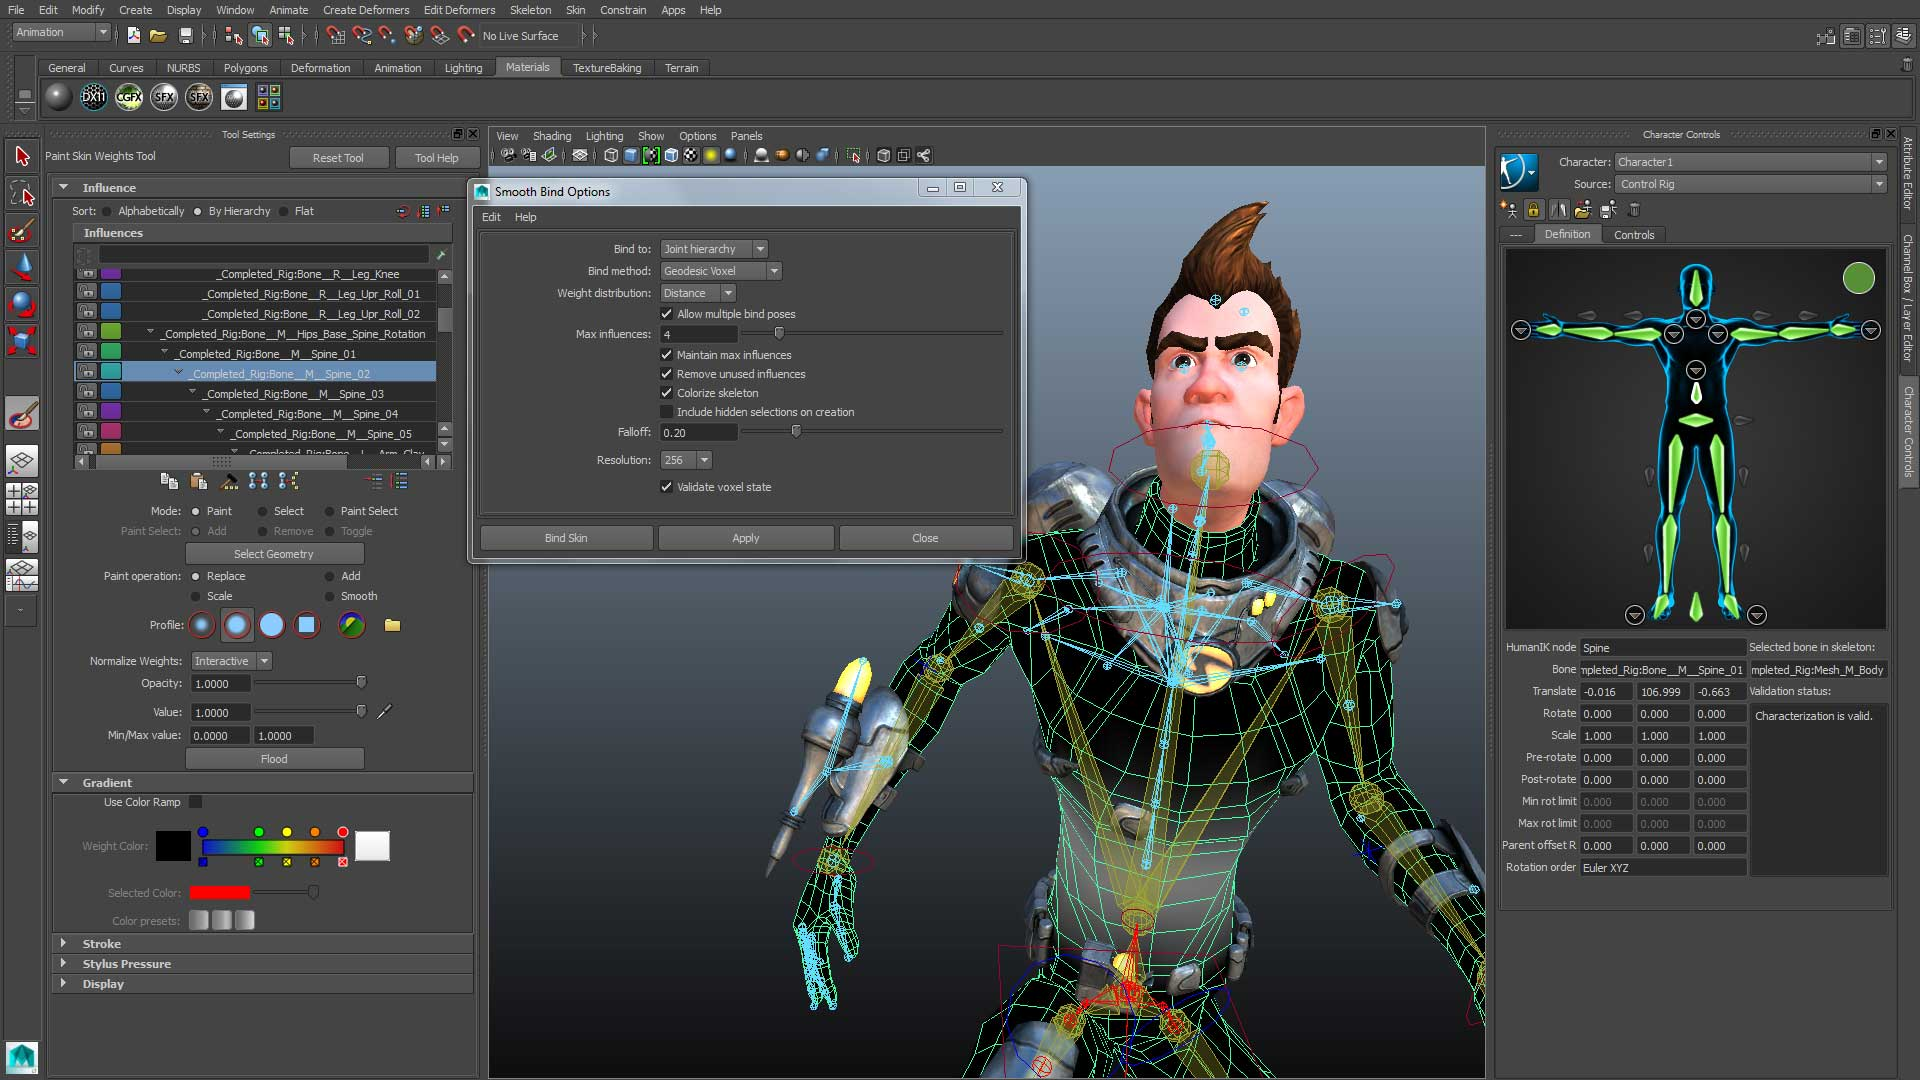 Autodesk Announces Maya. Max. Mudbox for 2015 - Lesterbanks